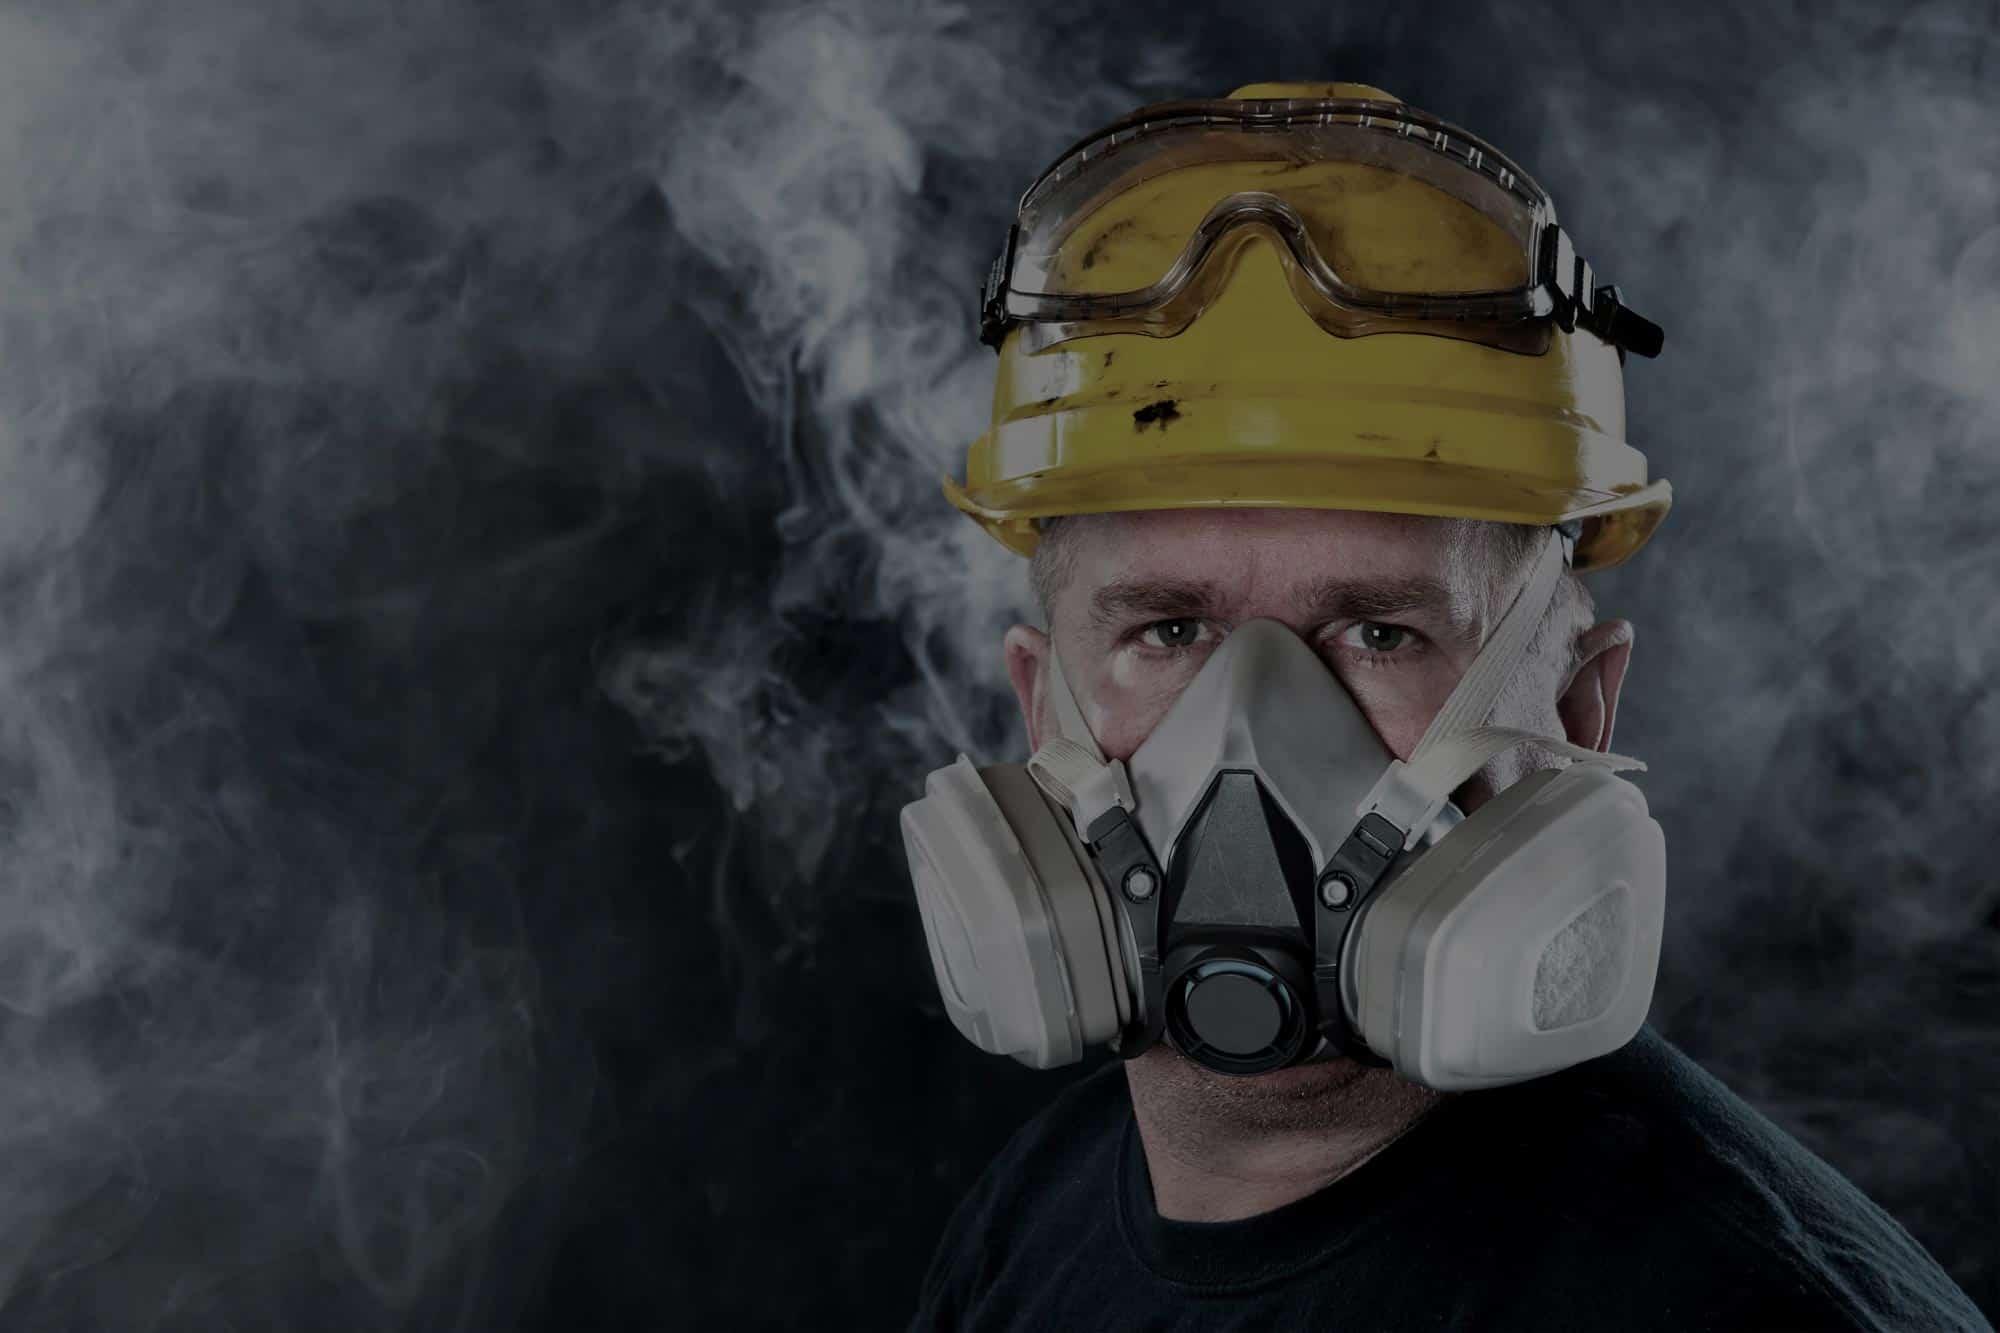 Protection-Restpiratoire-Masque-02